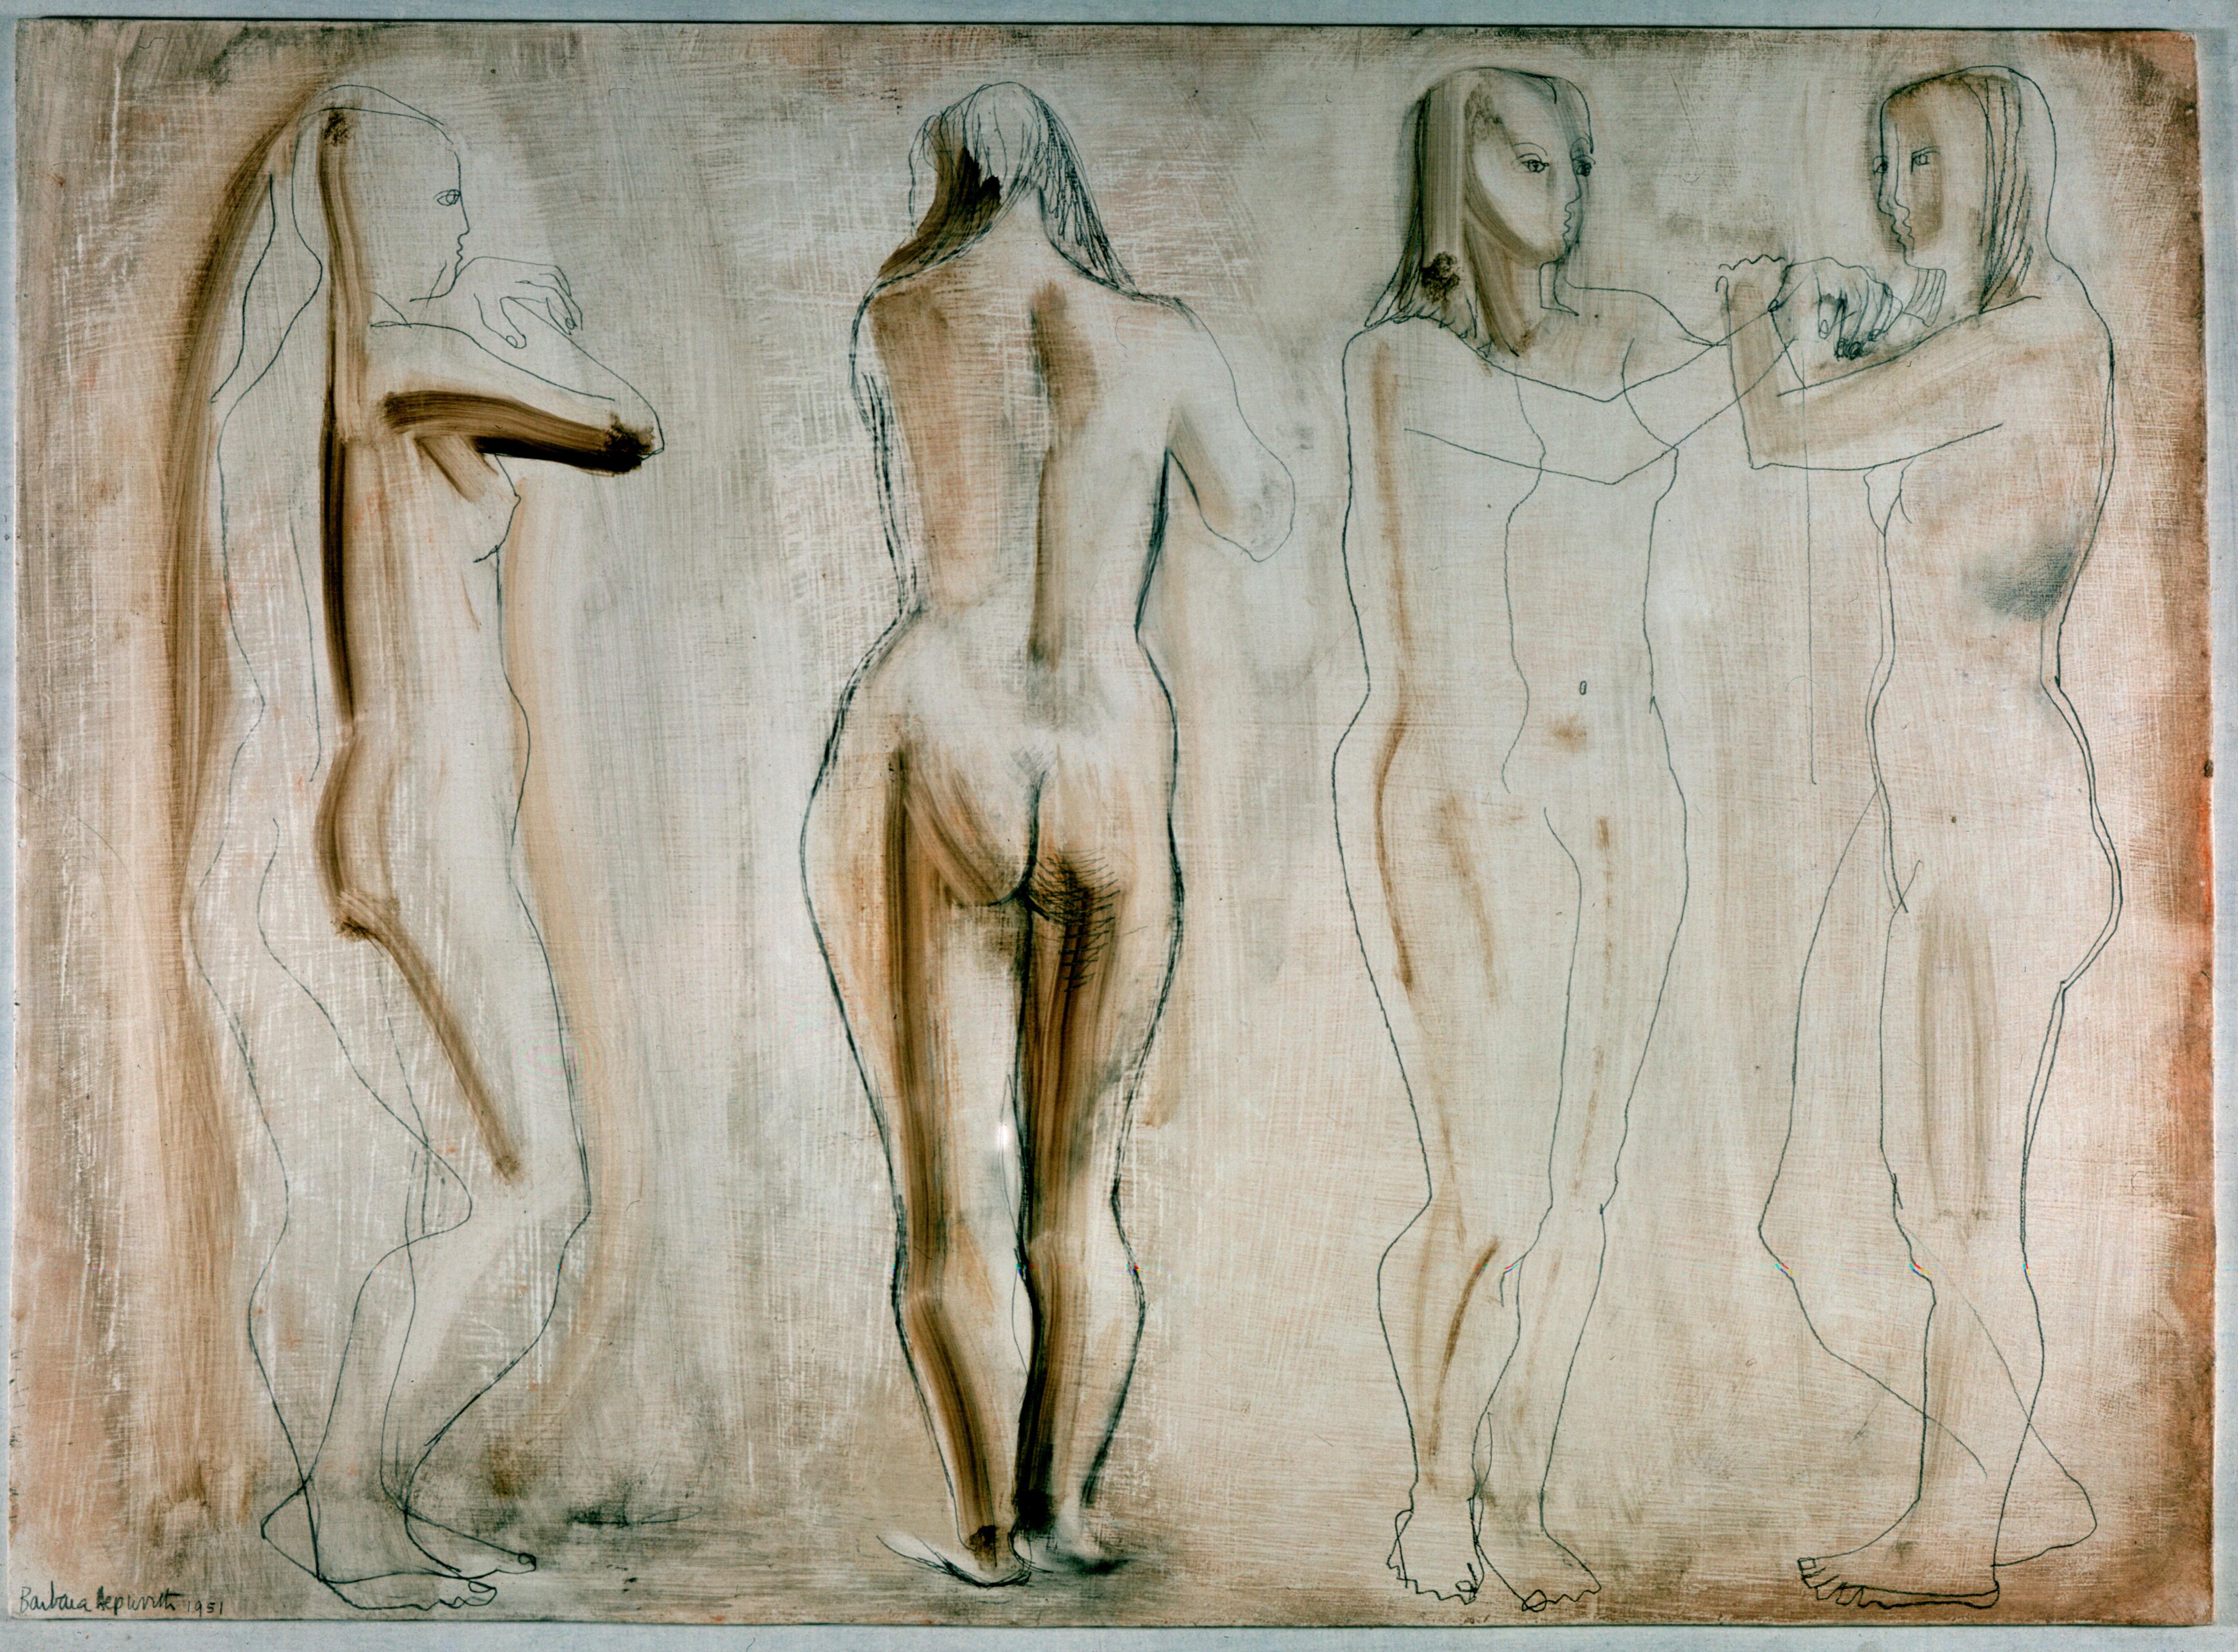 contemporary feminist artists